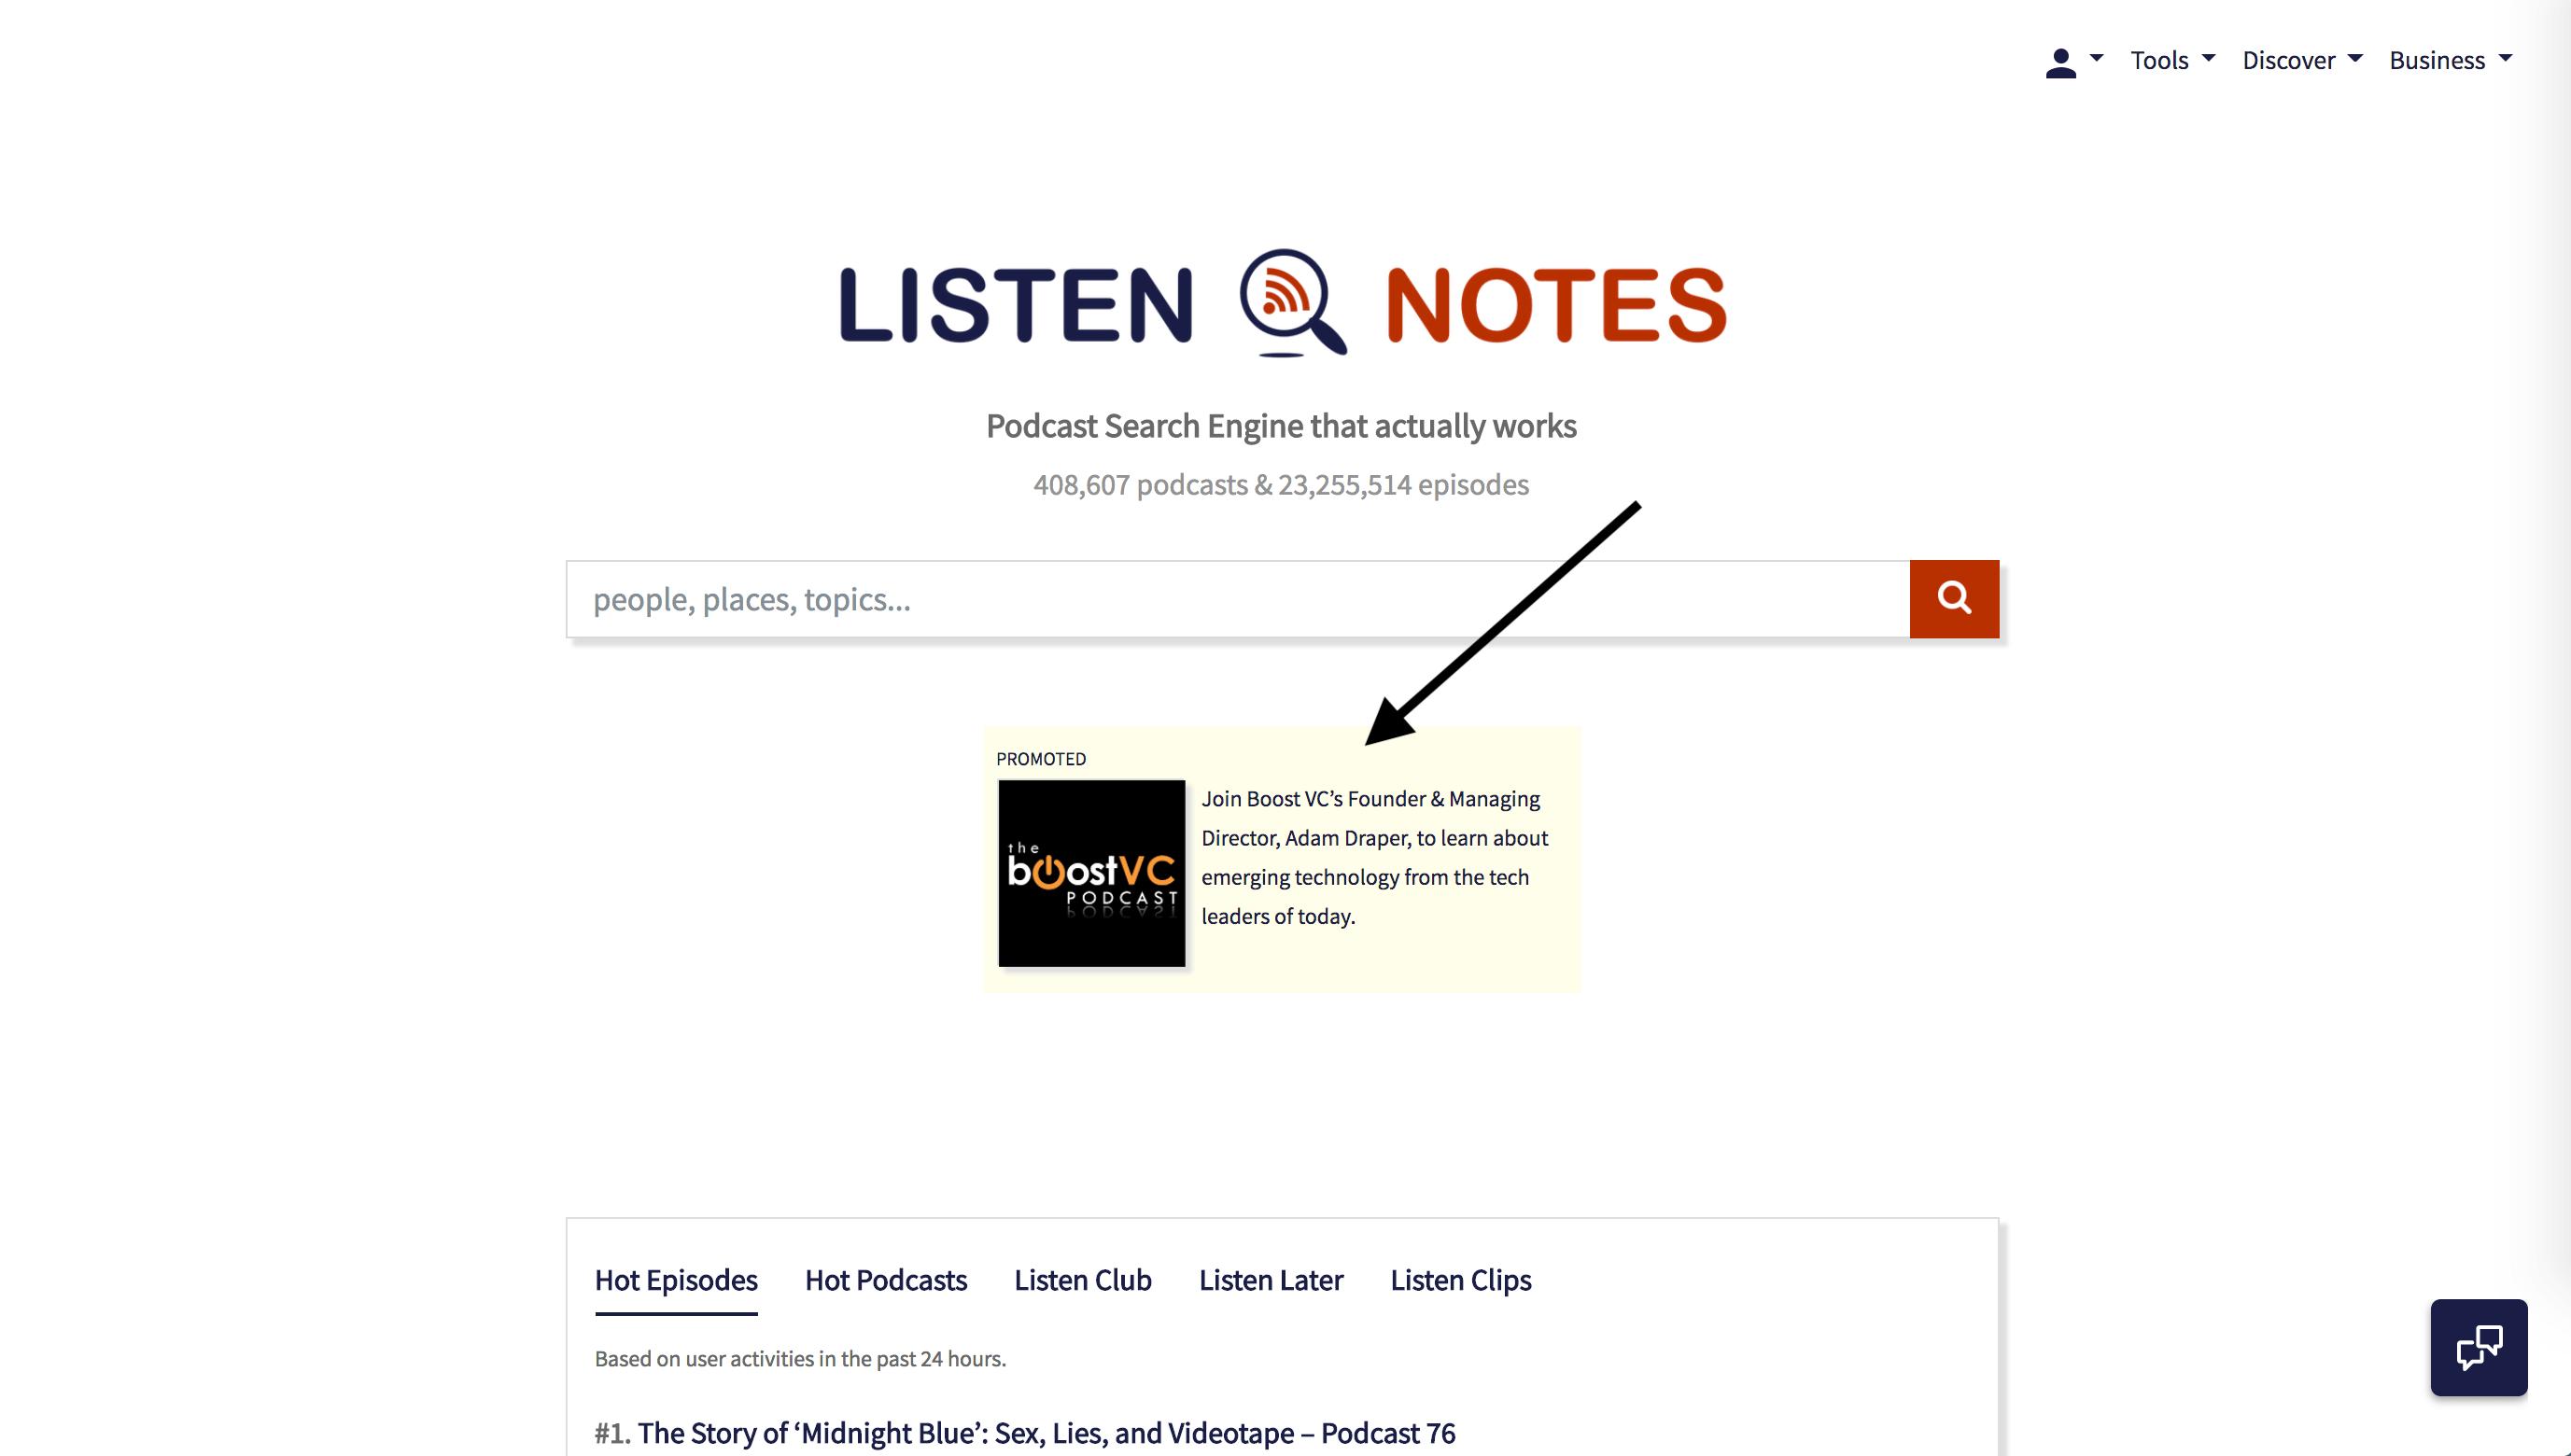 Listen Notes Homepage Banner Ads